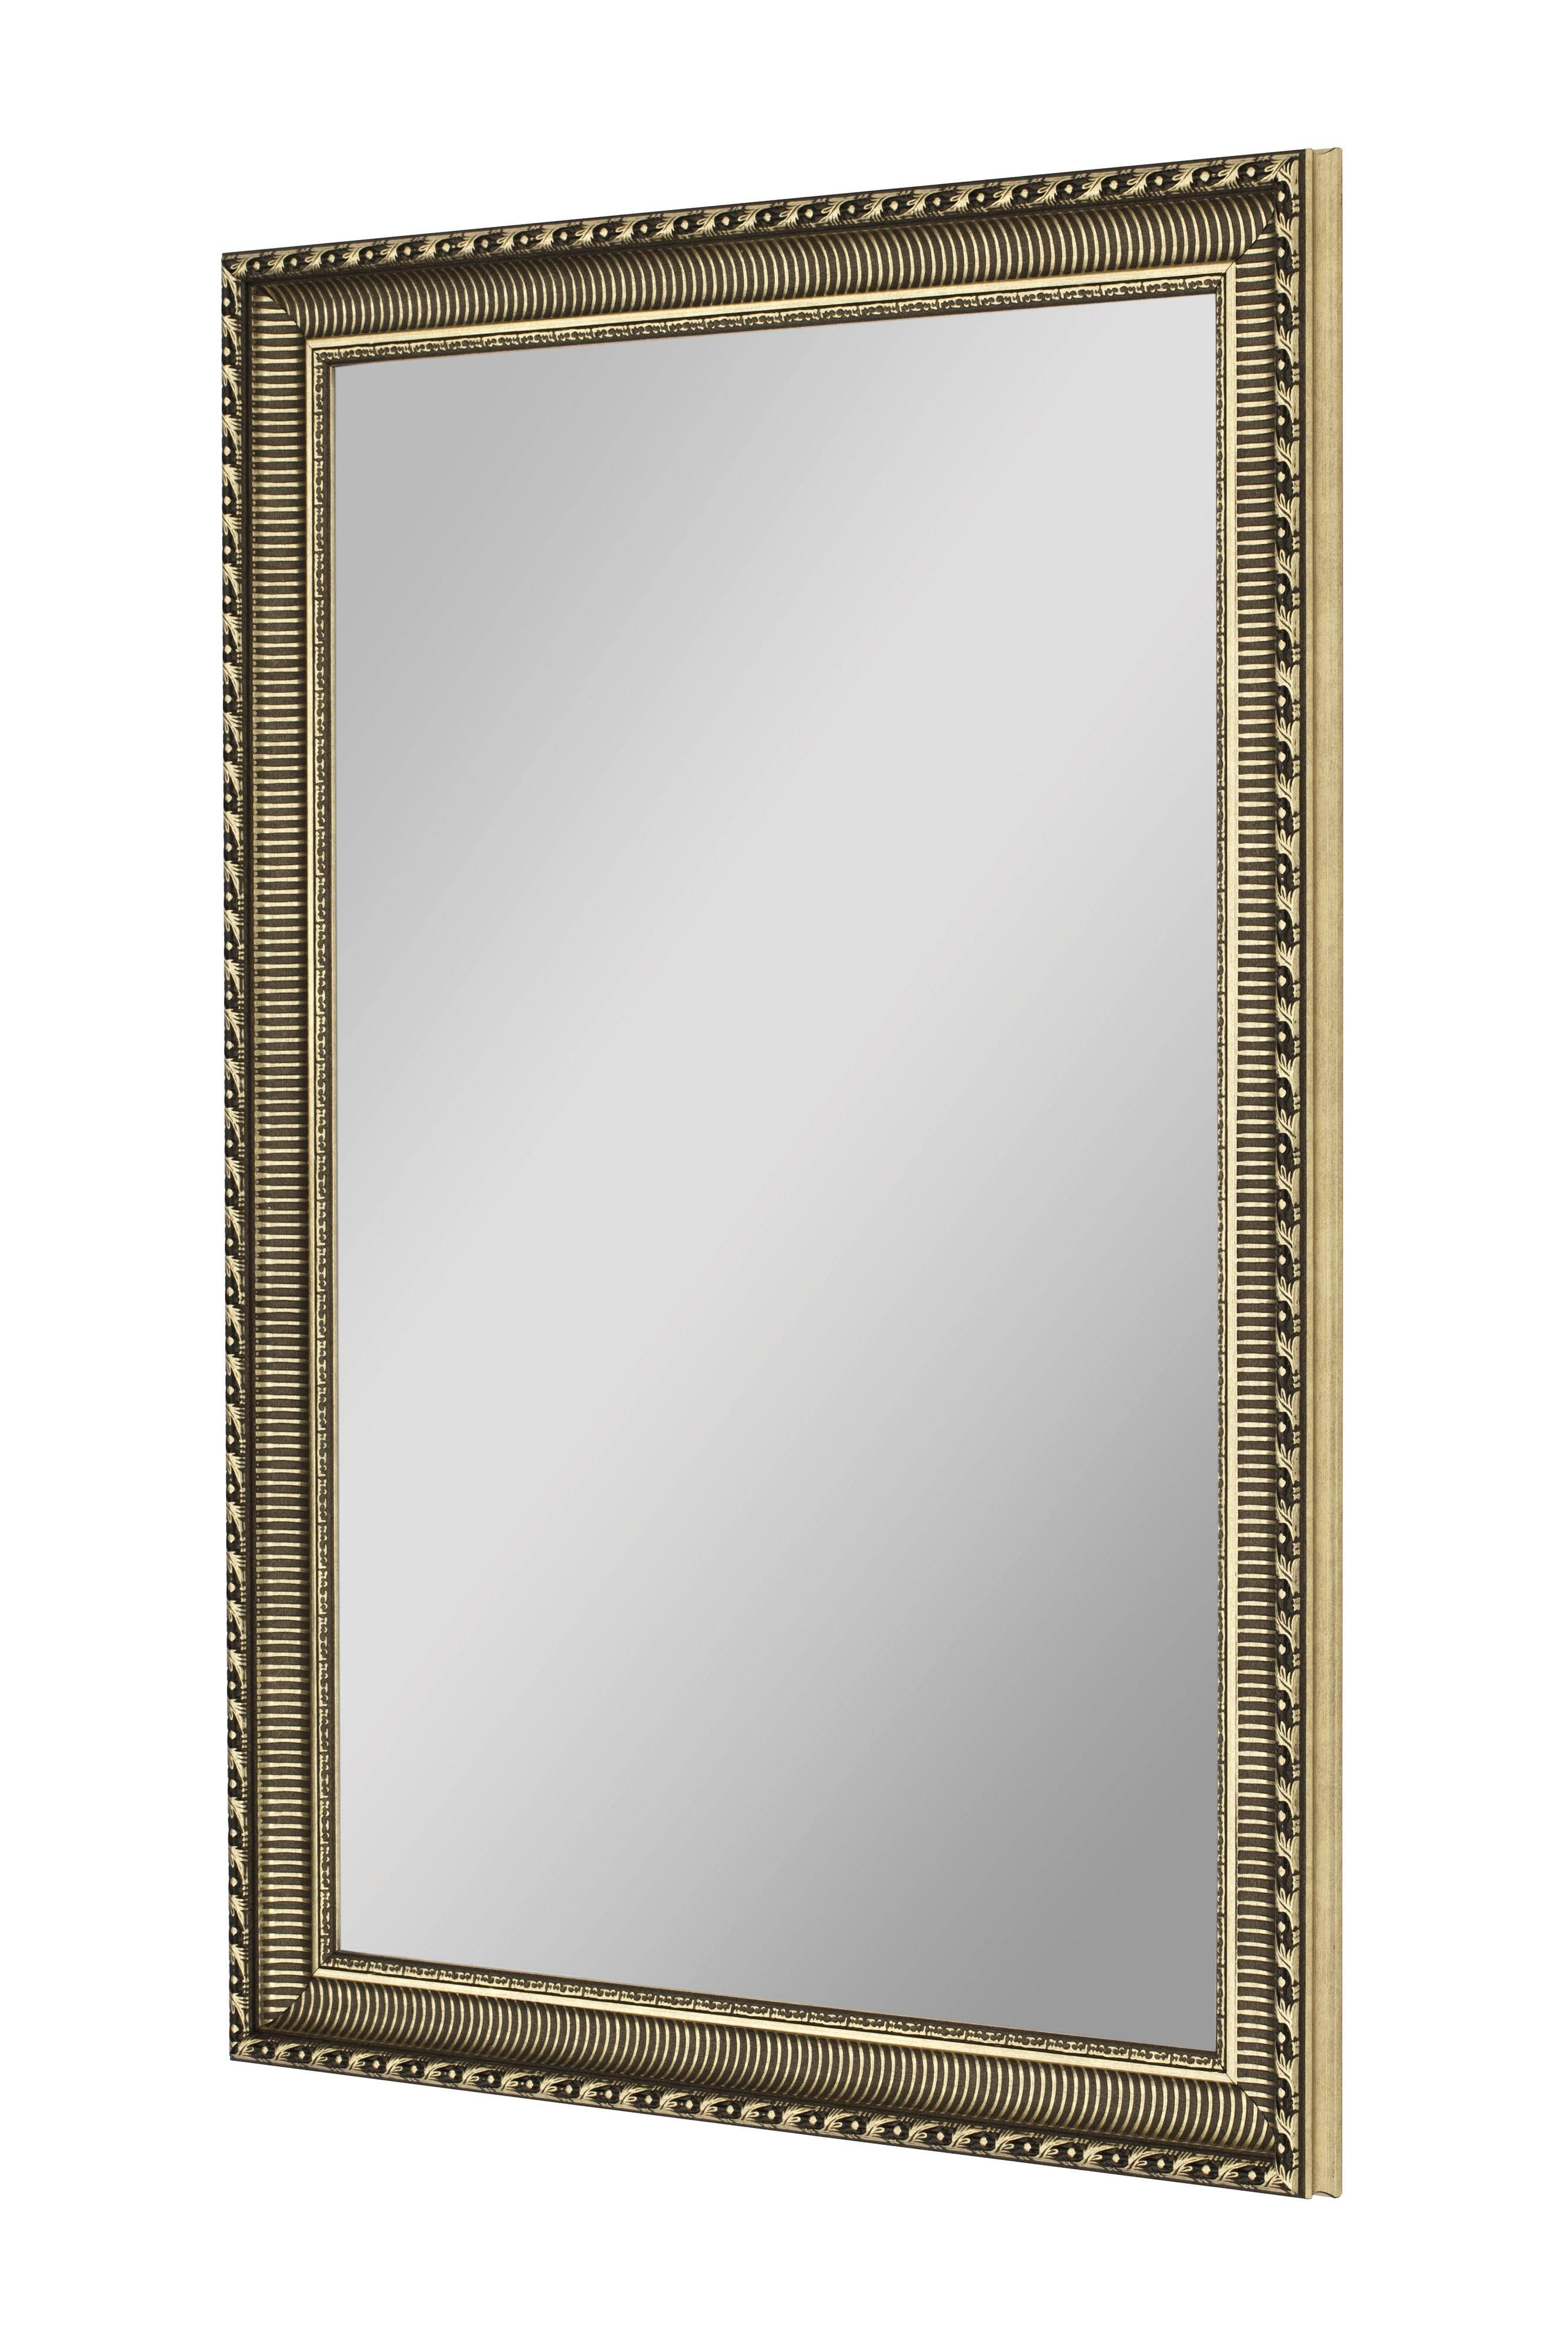 Contemporary Wall Mirrors Decorative Mirror Wall Decor Mirror